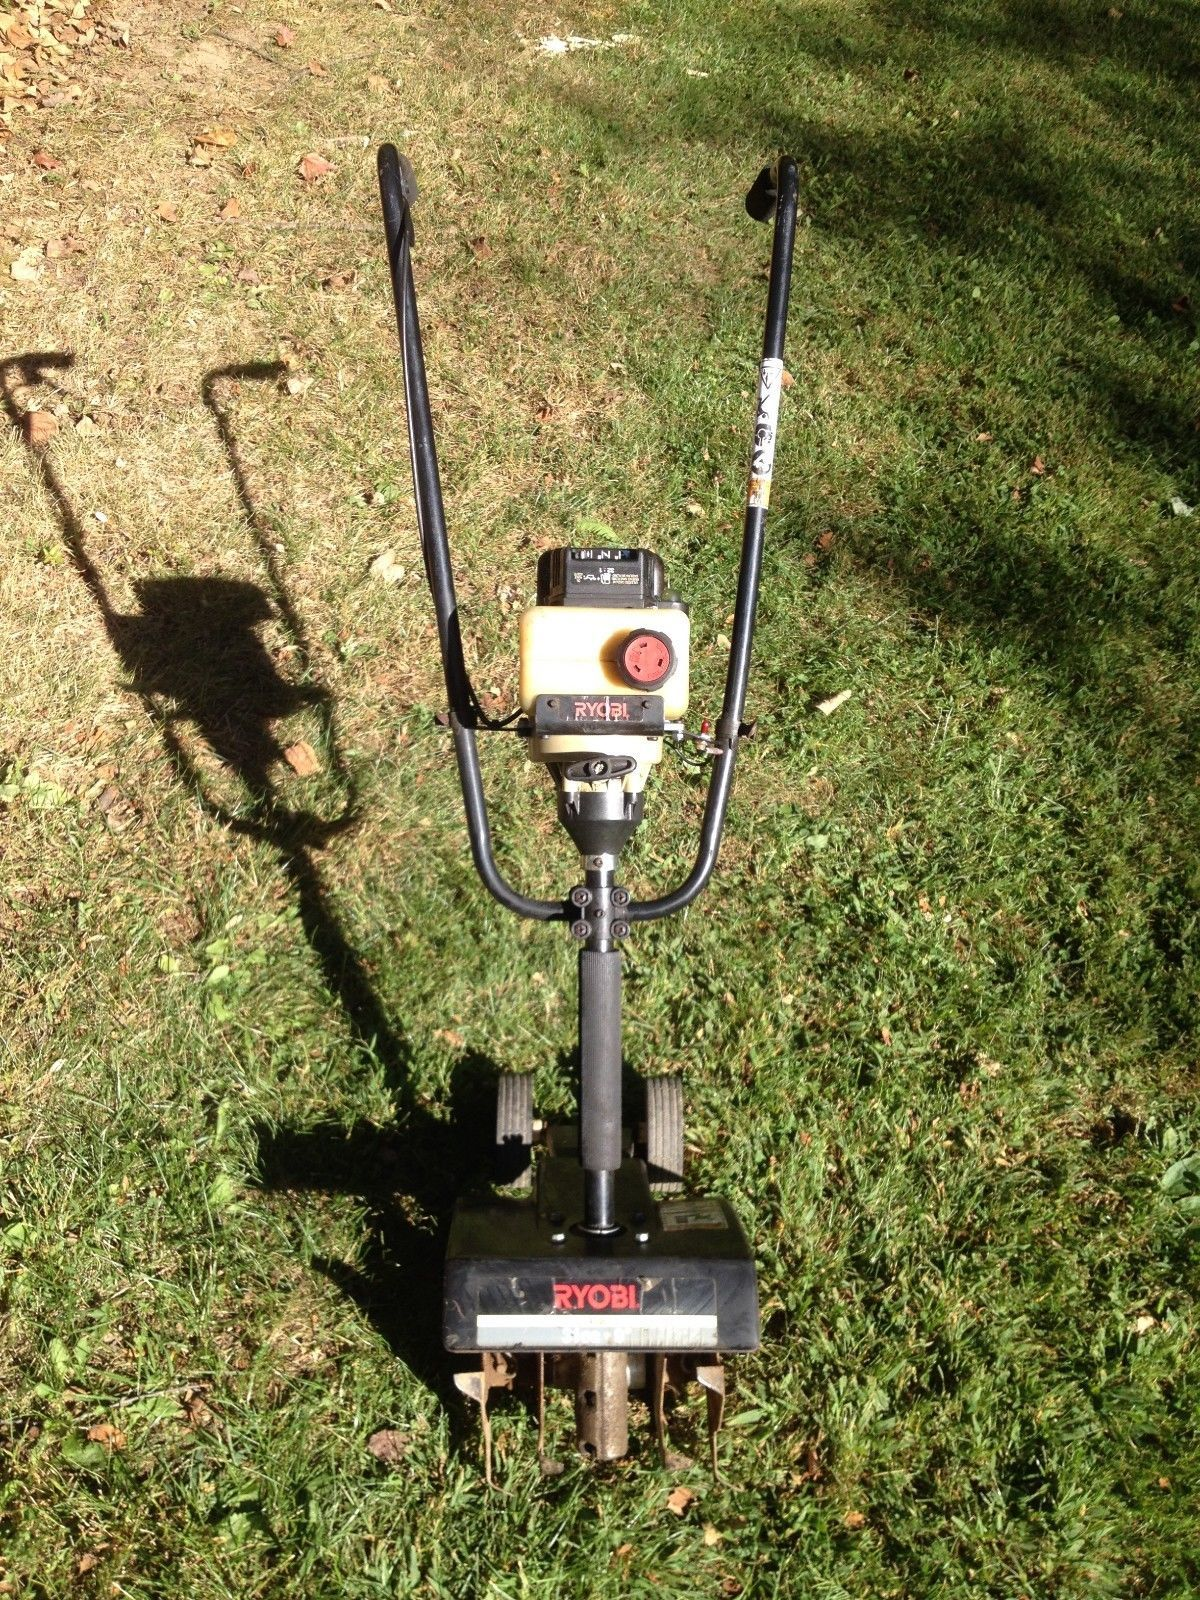 RYOBI 410R Mini Tiller/Cultivator and 50 similar items